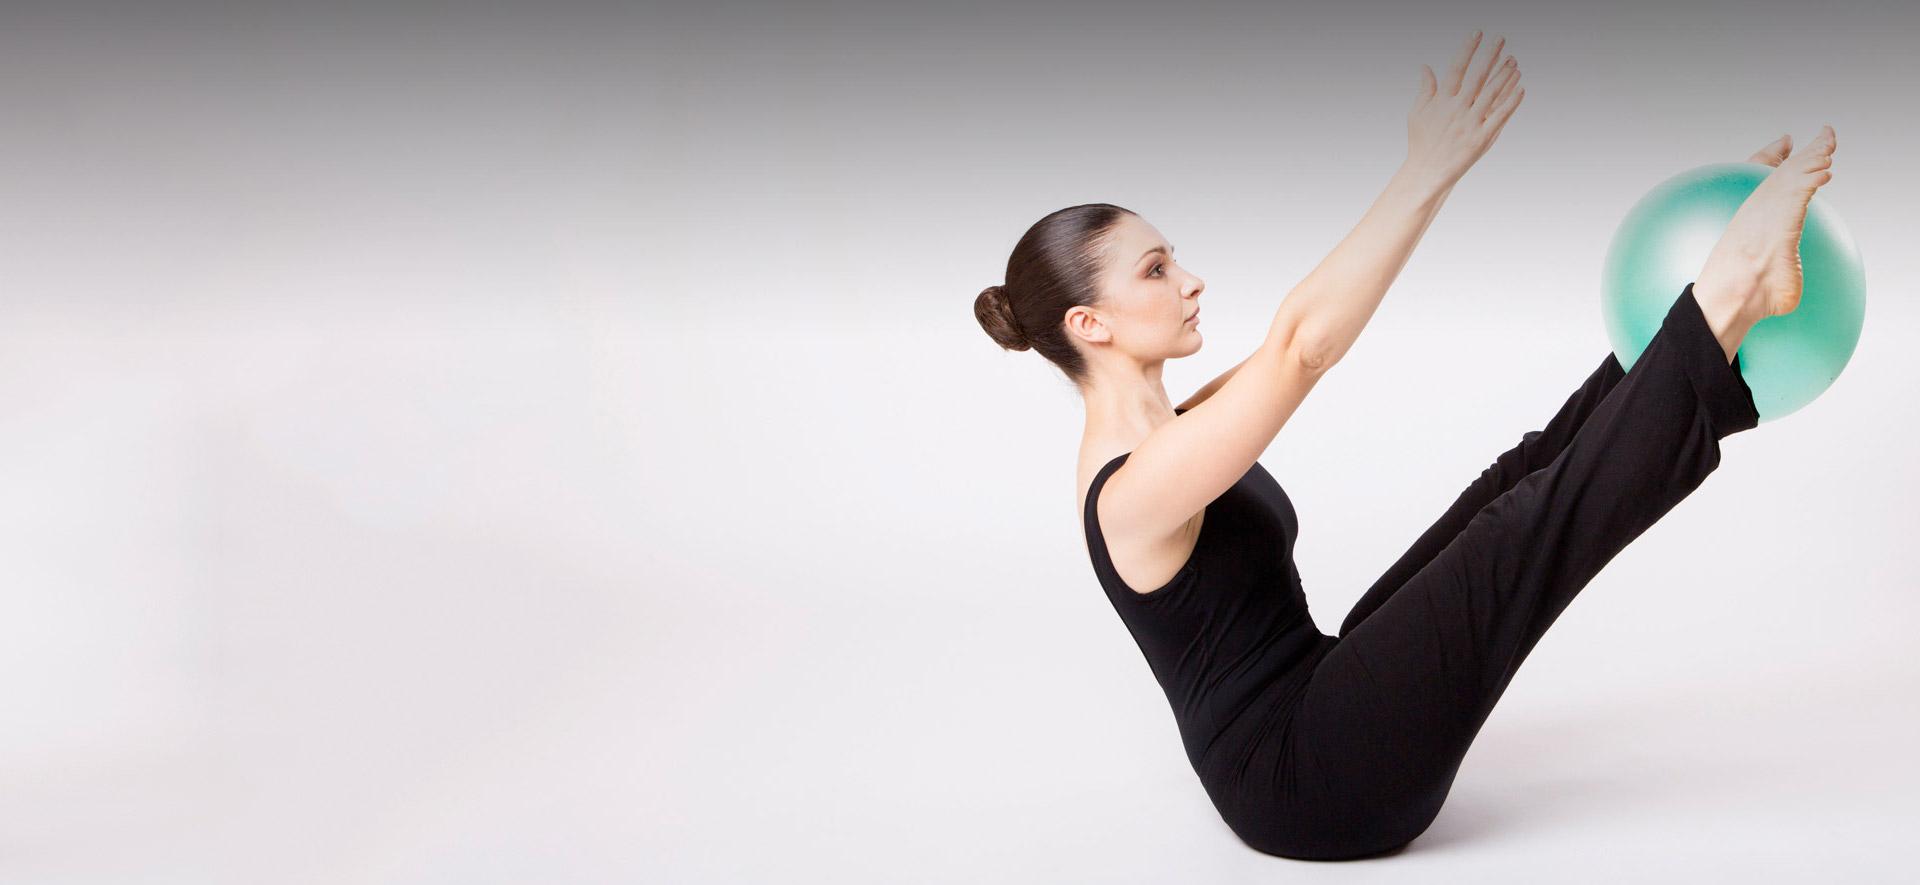 Pilates Frosinone - Teaser 2